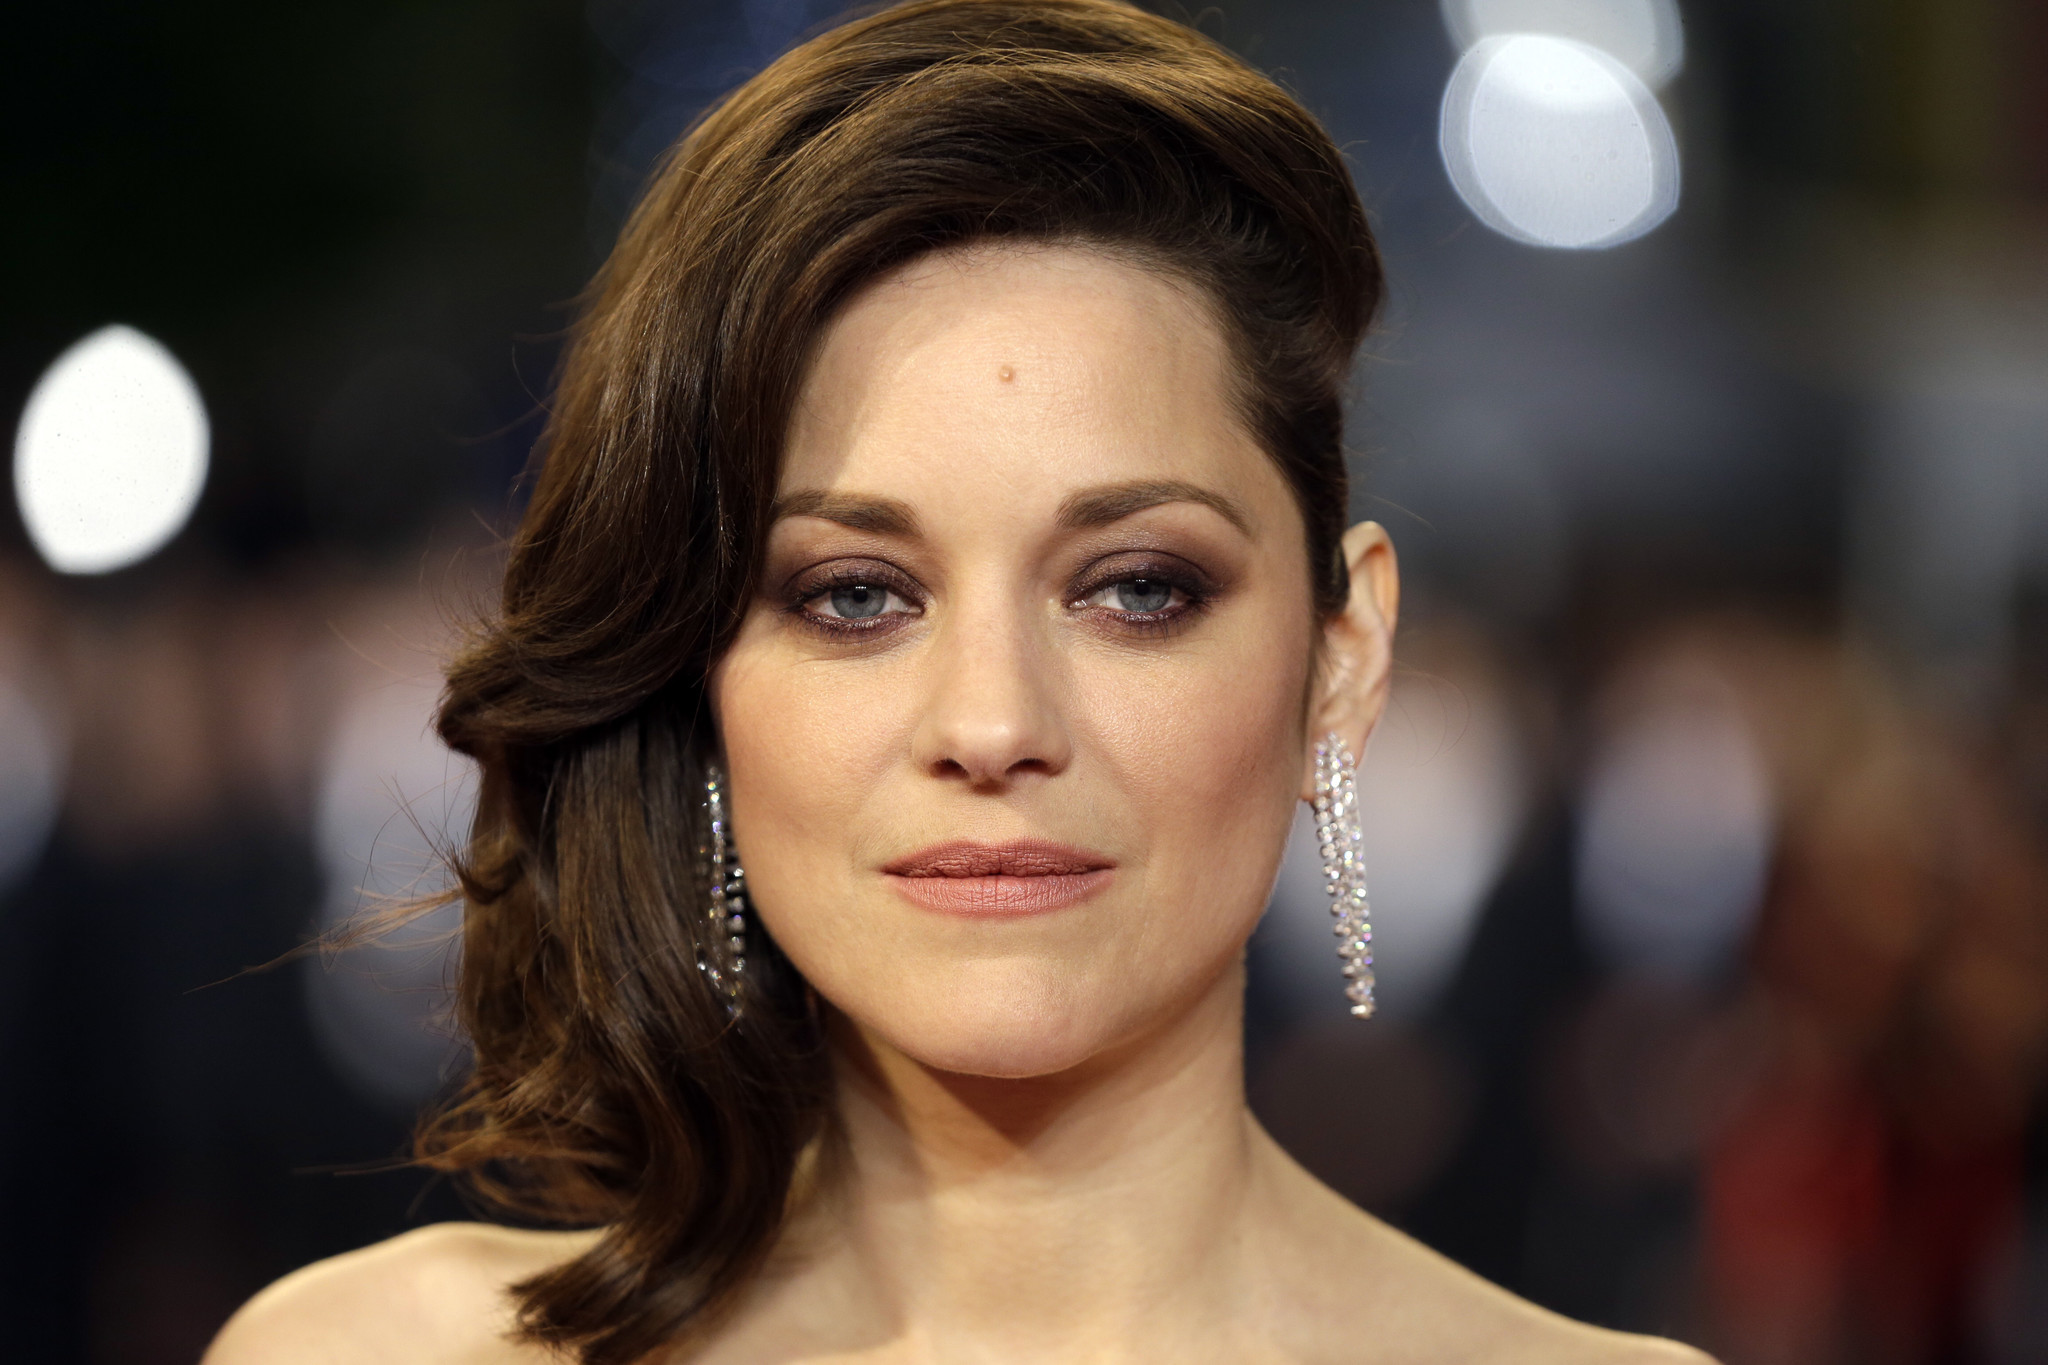 Marion Cotillard Announces Pregnancy Denies Brad Pitt Reports